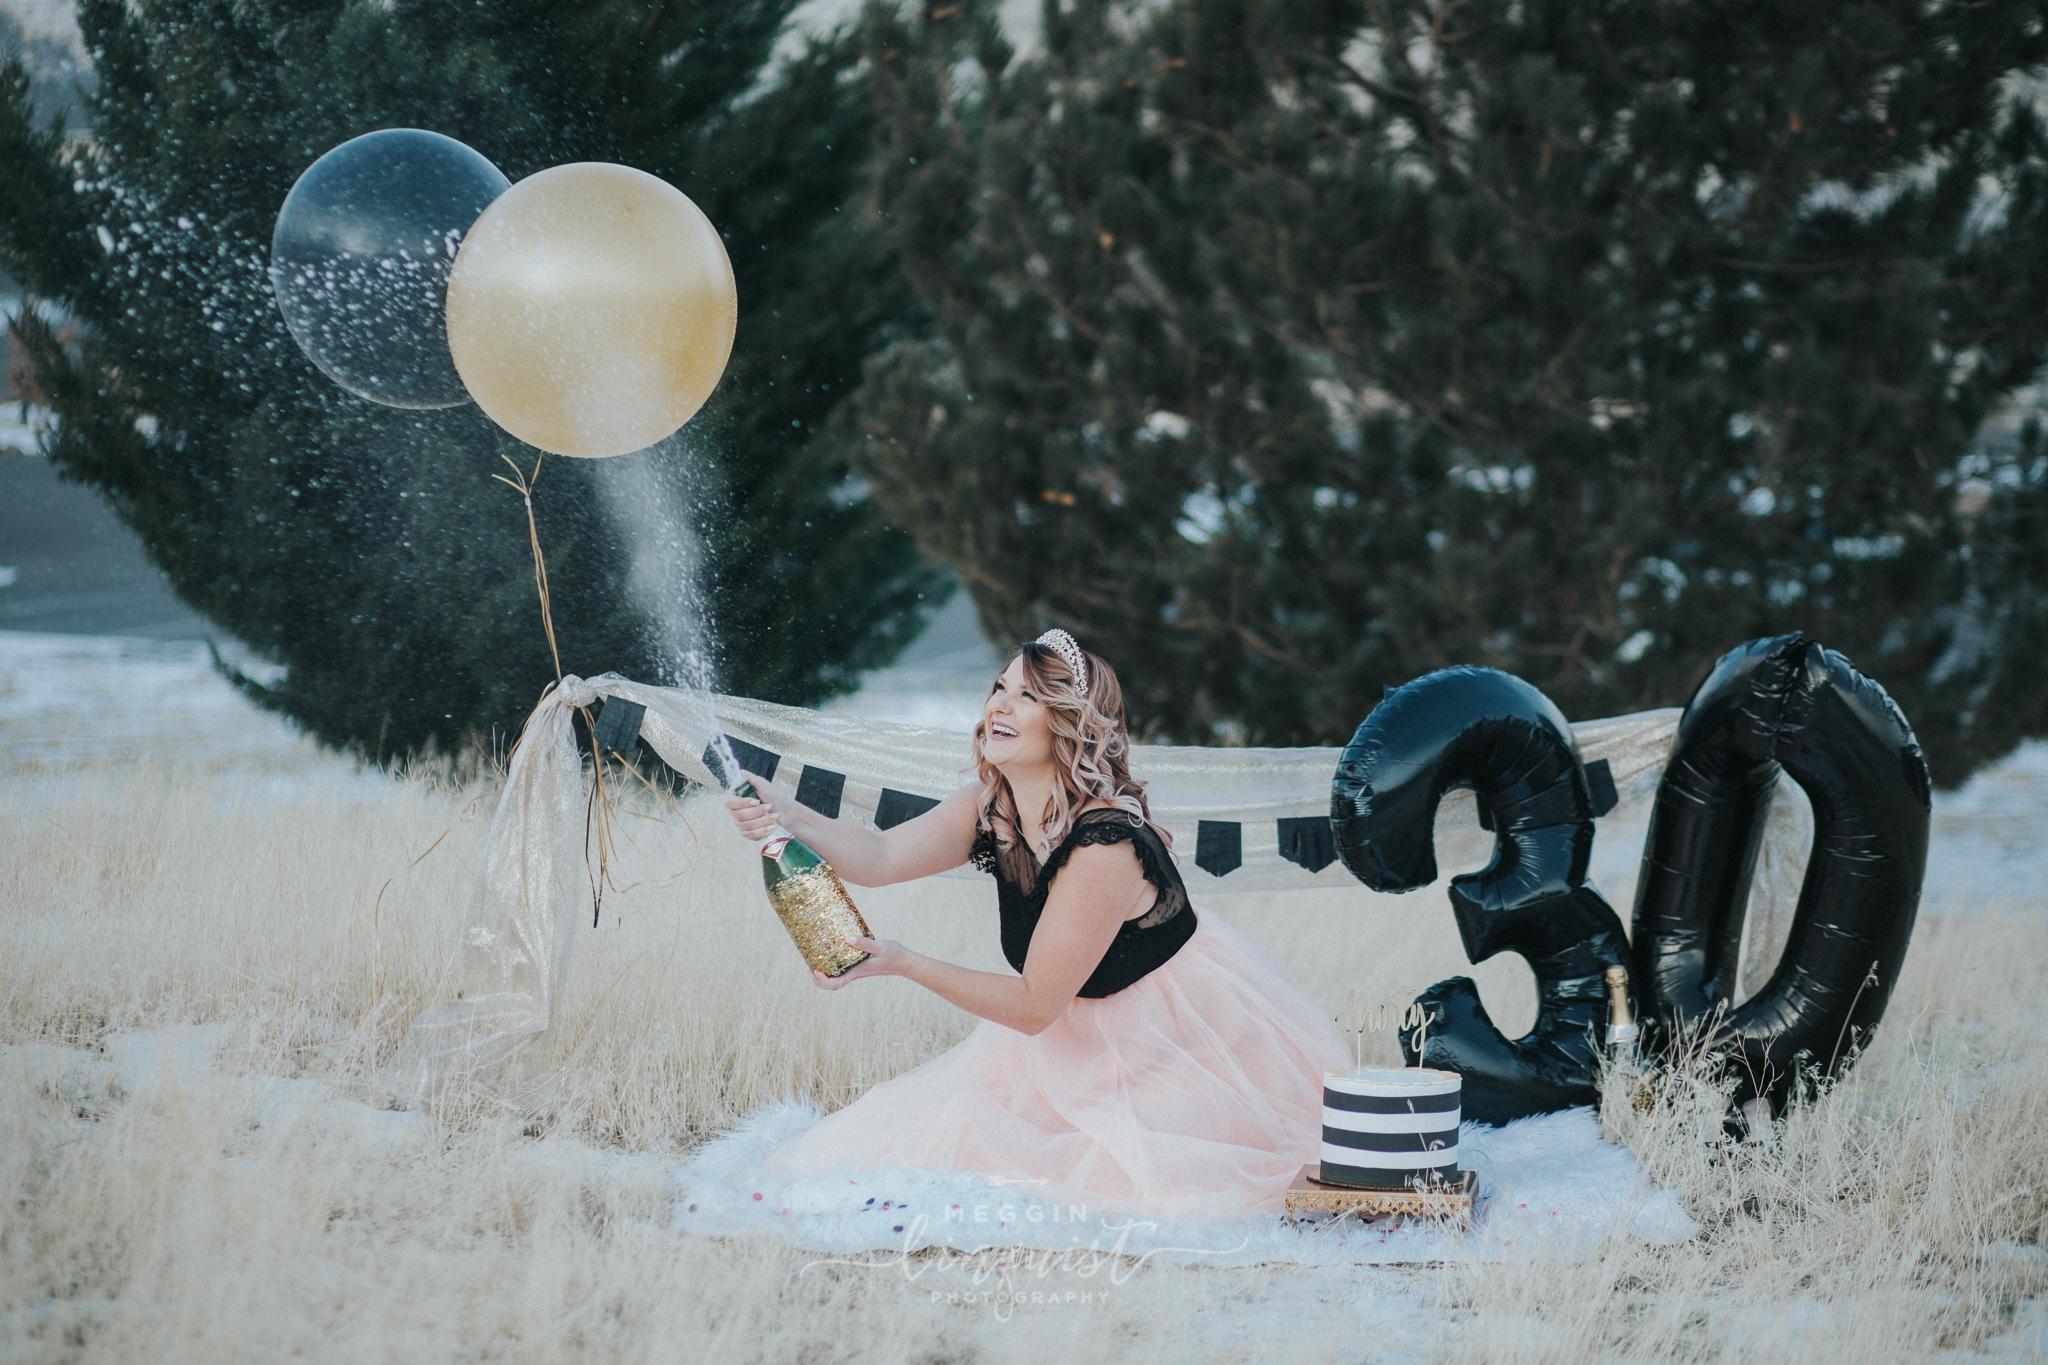 30th-birthday-cake-smash-reno-lake-tahoe-photographer-10.jpg